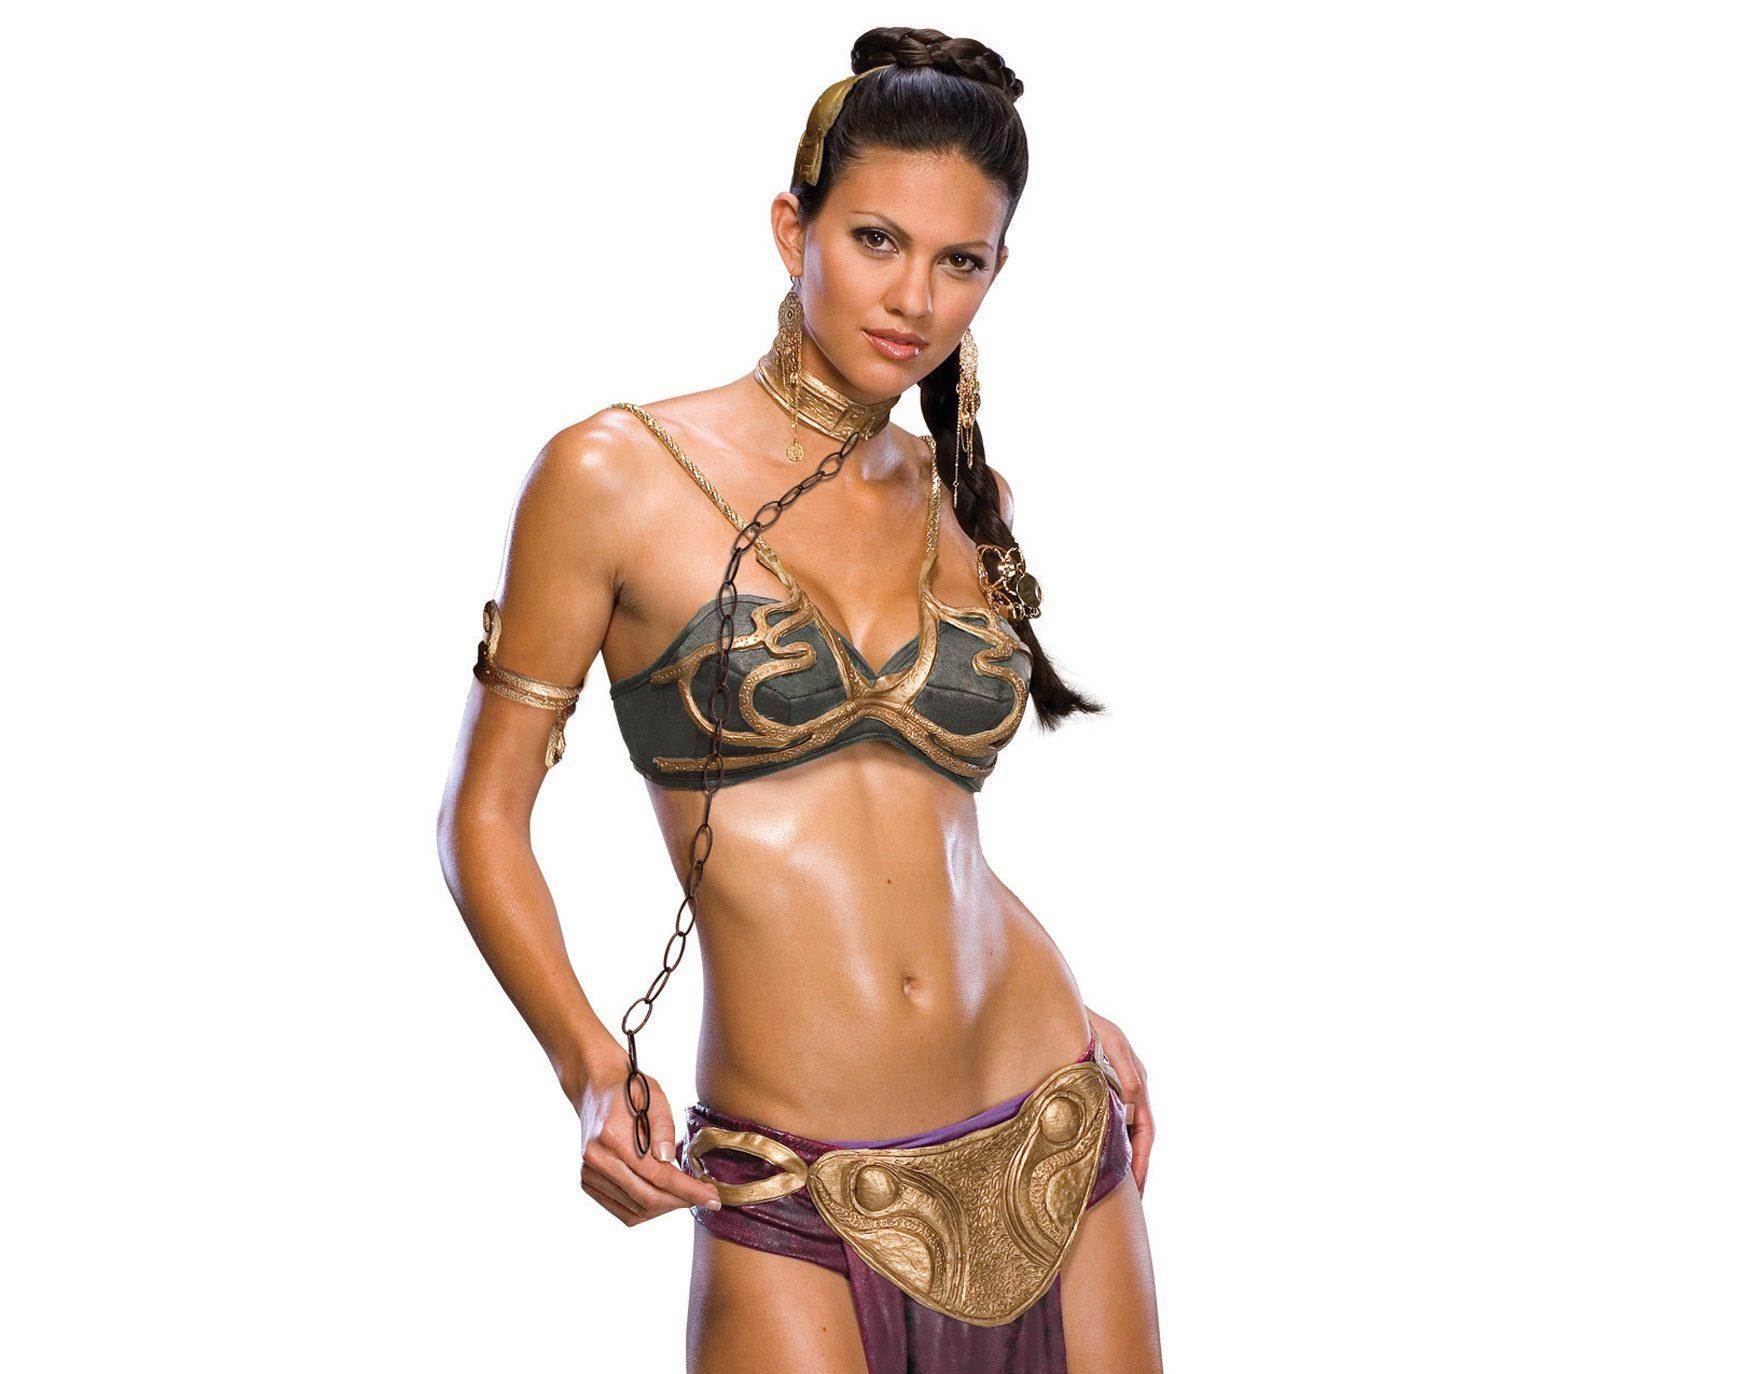 Top 10 Sexy Halloween Costumes - Sexy Princess Leia Slave Costume